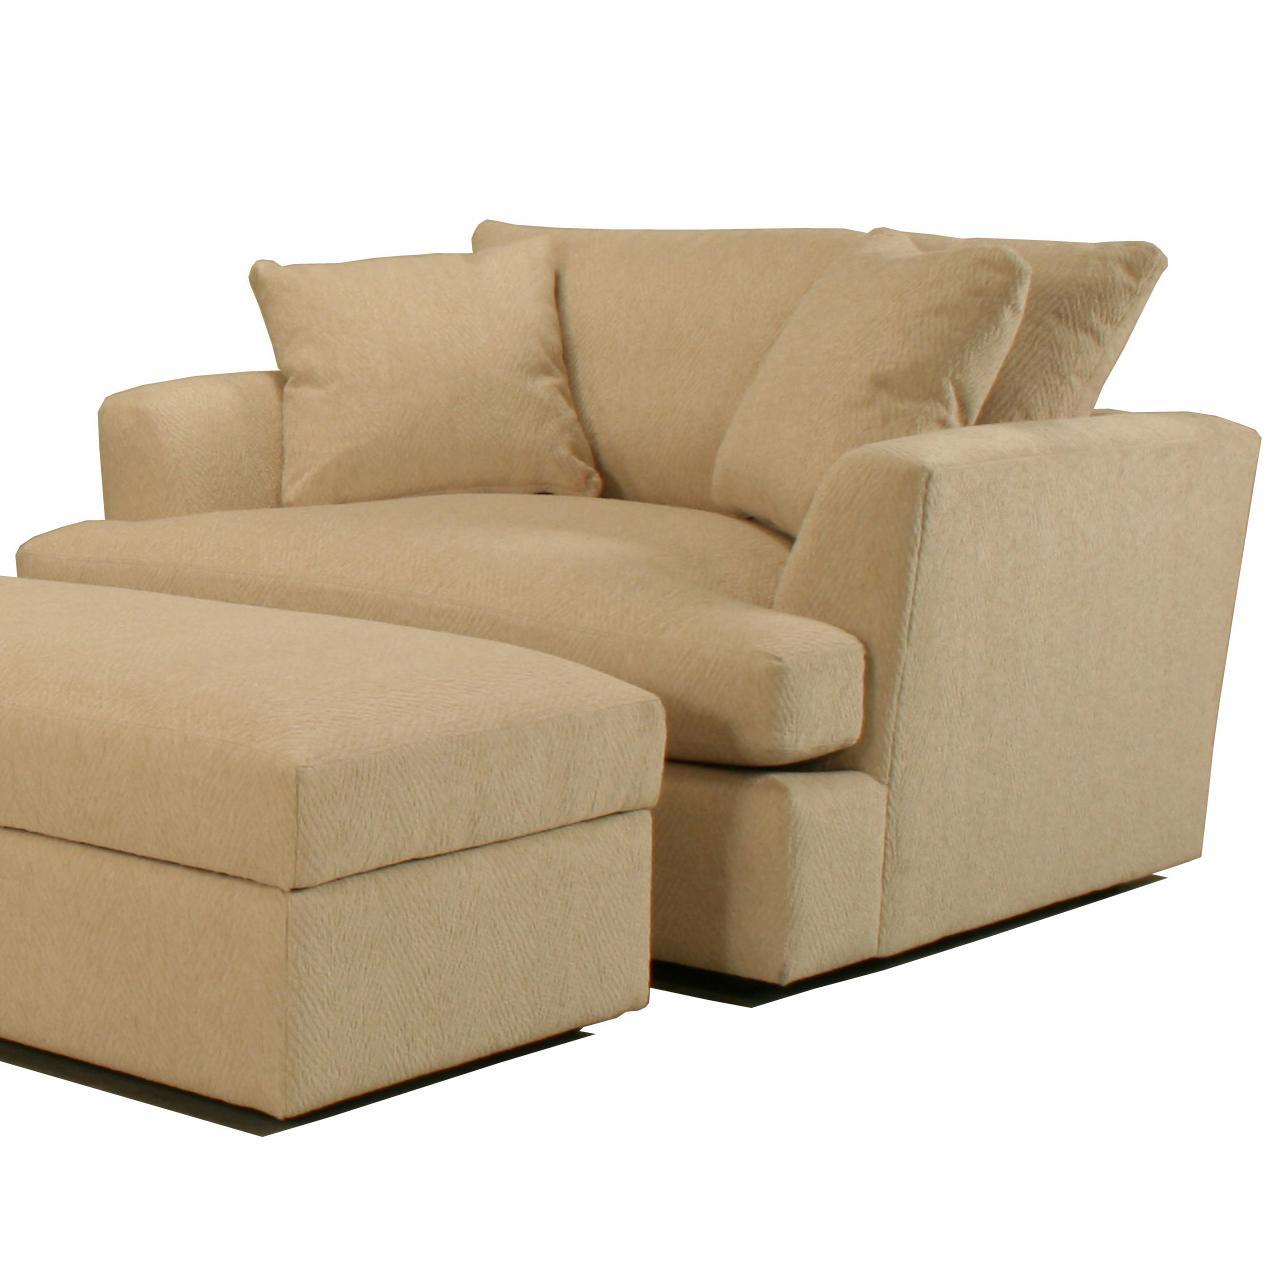 Cirrus Chair and a Half by BeModern at Belfort Furniture